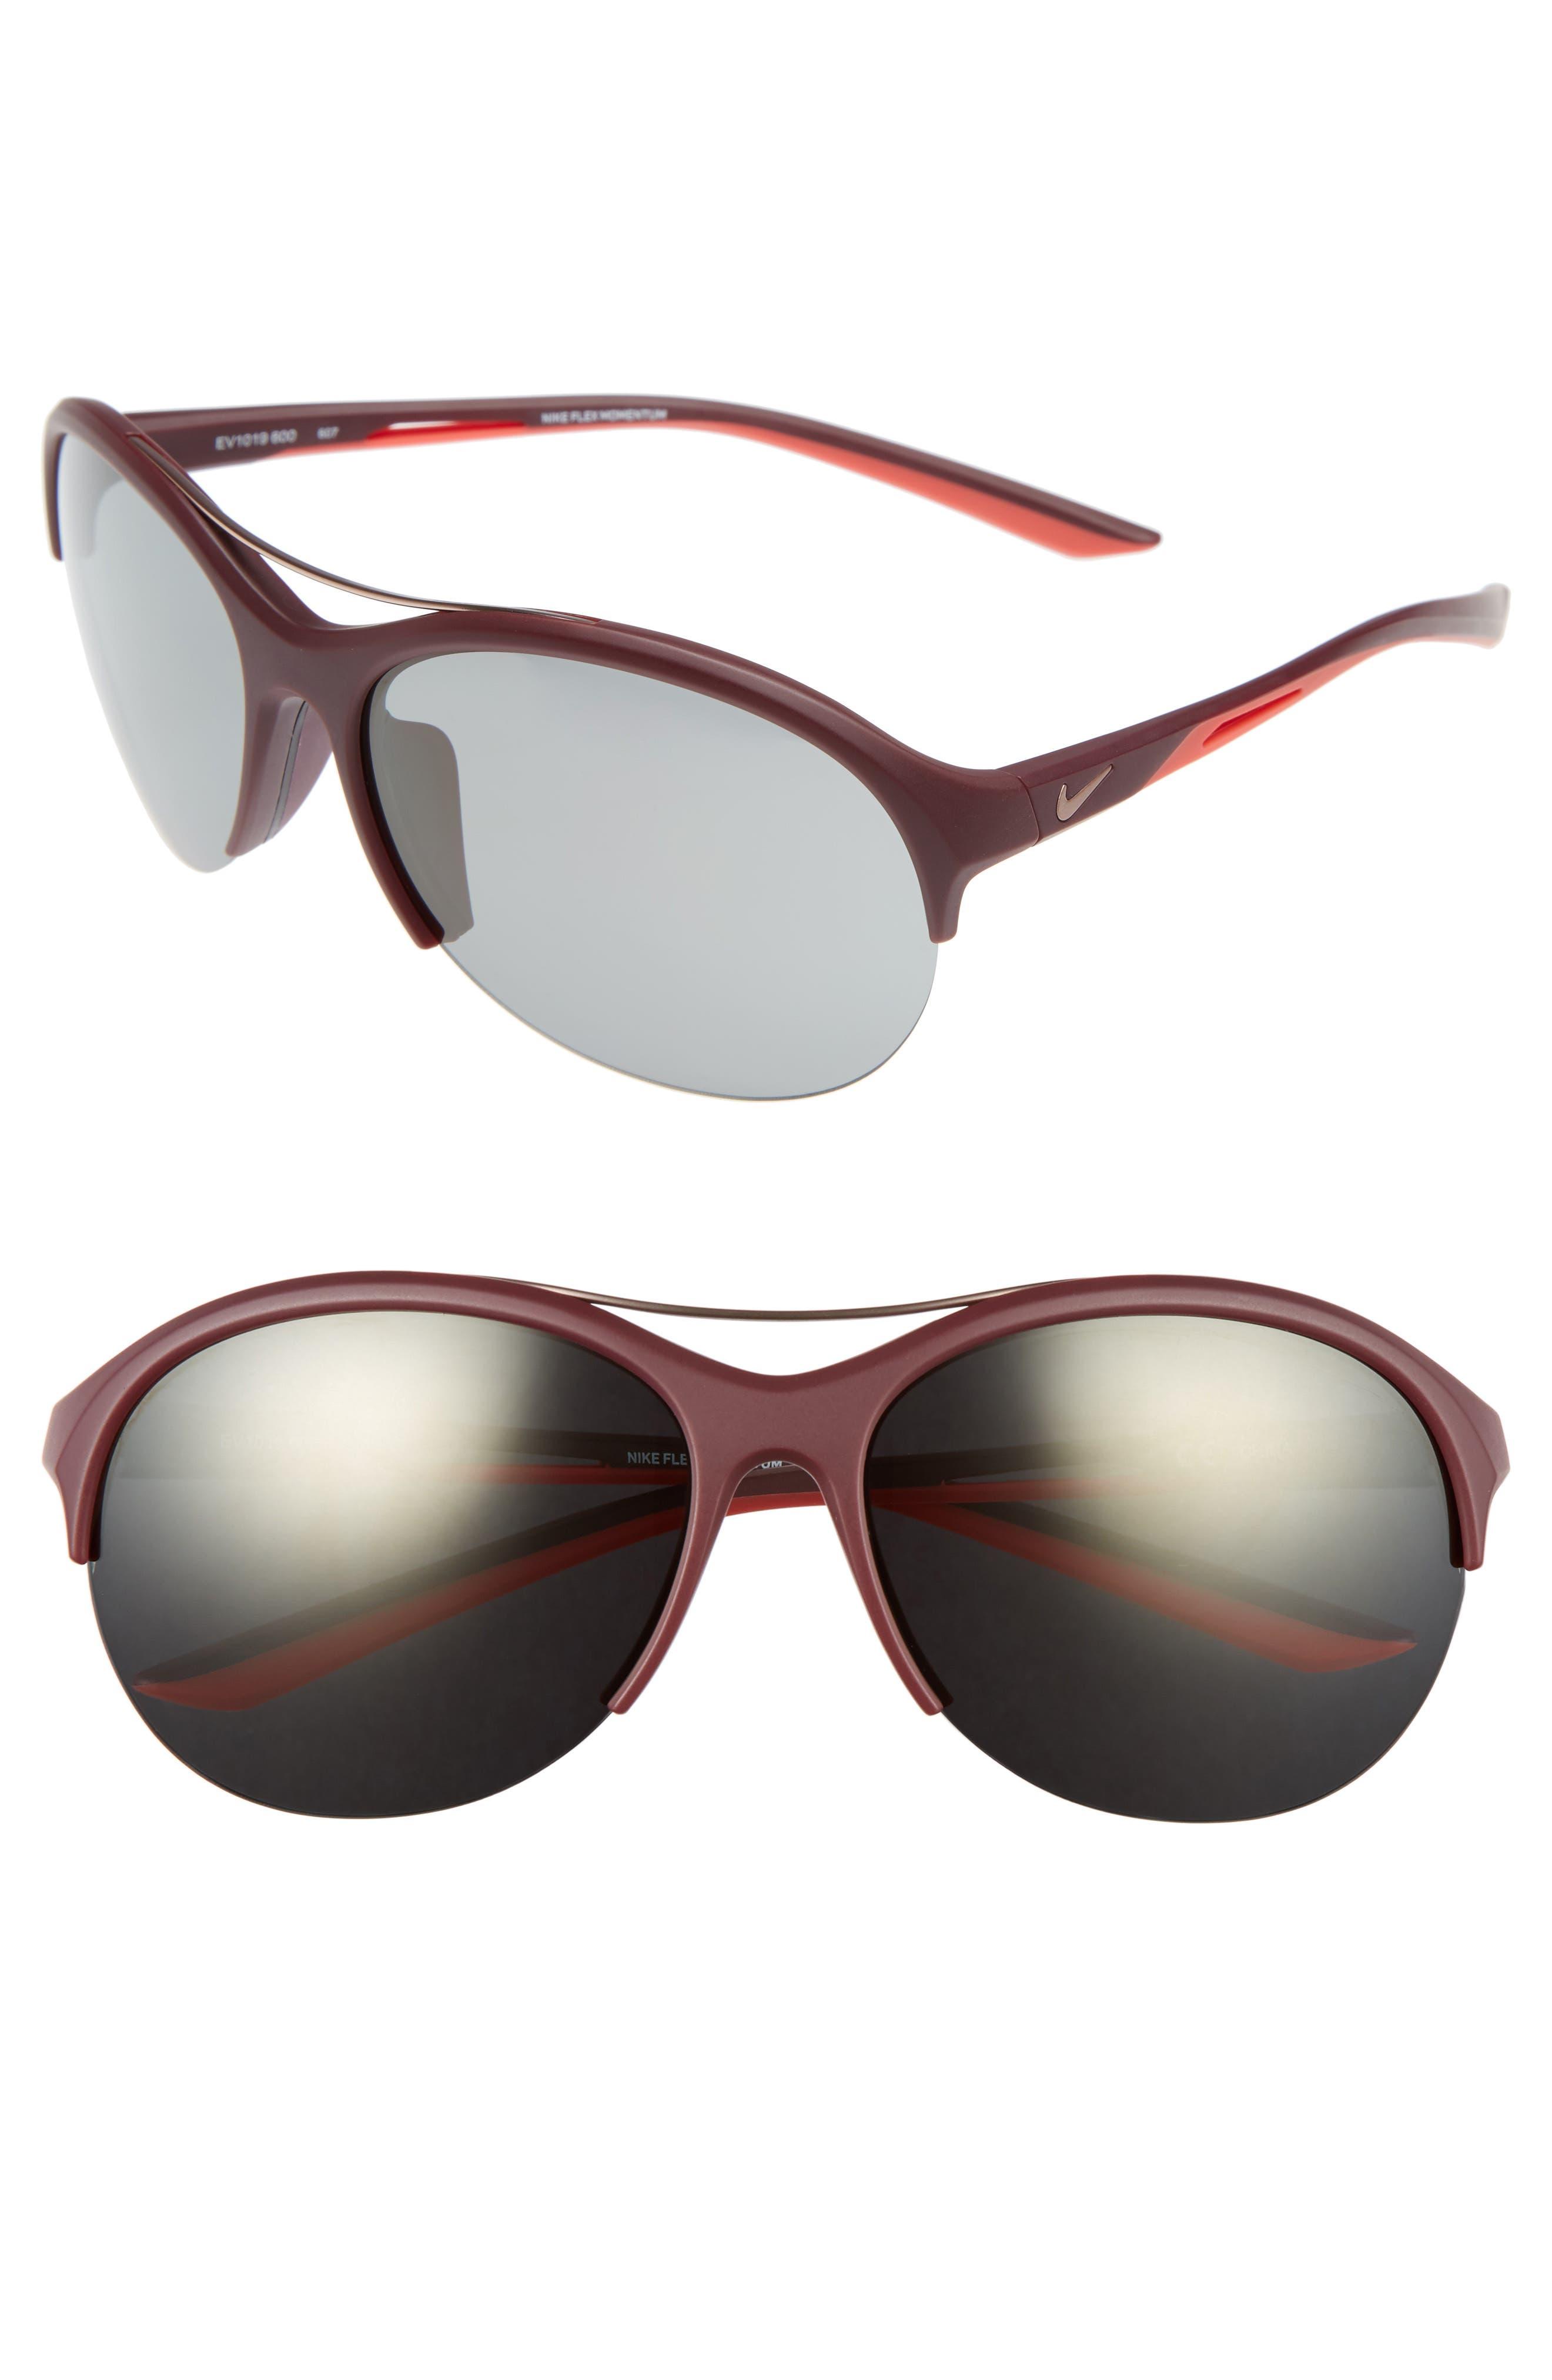 Nike Flex Momentum 66mm Sunglasses